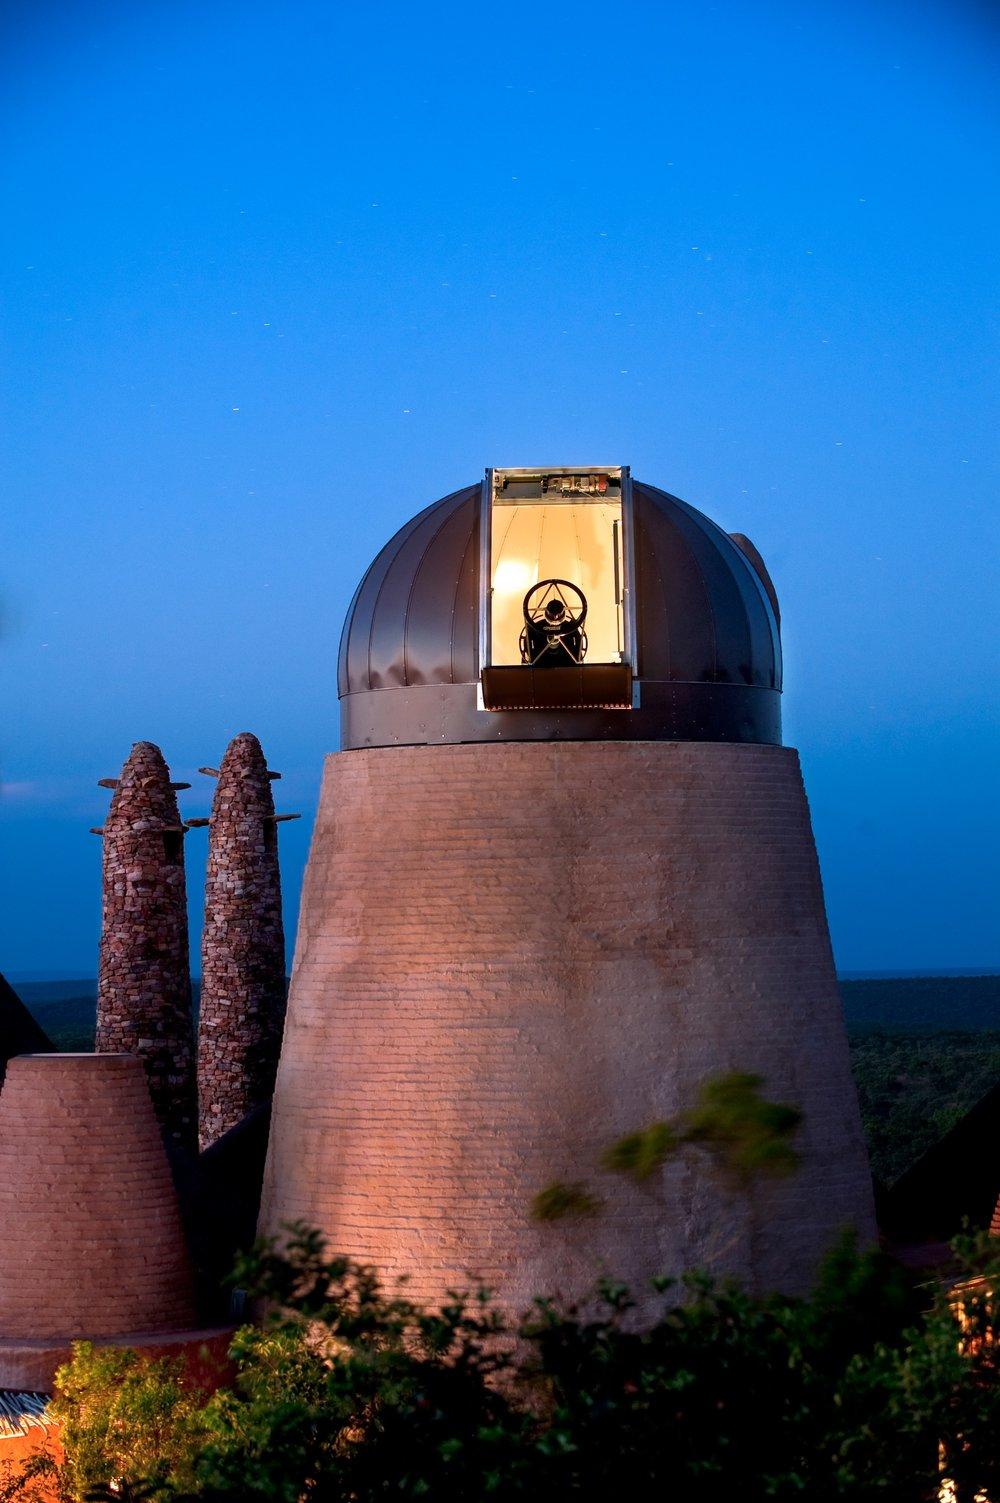 The Observatory observatory dook 27.jpg